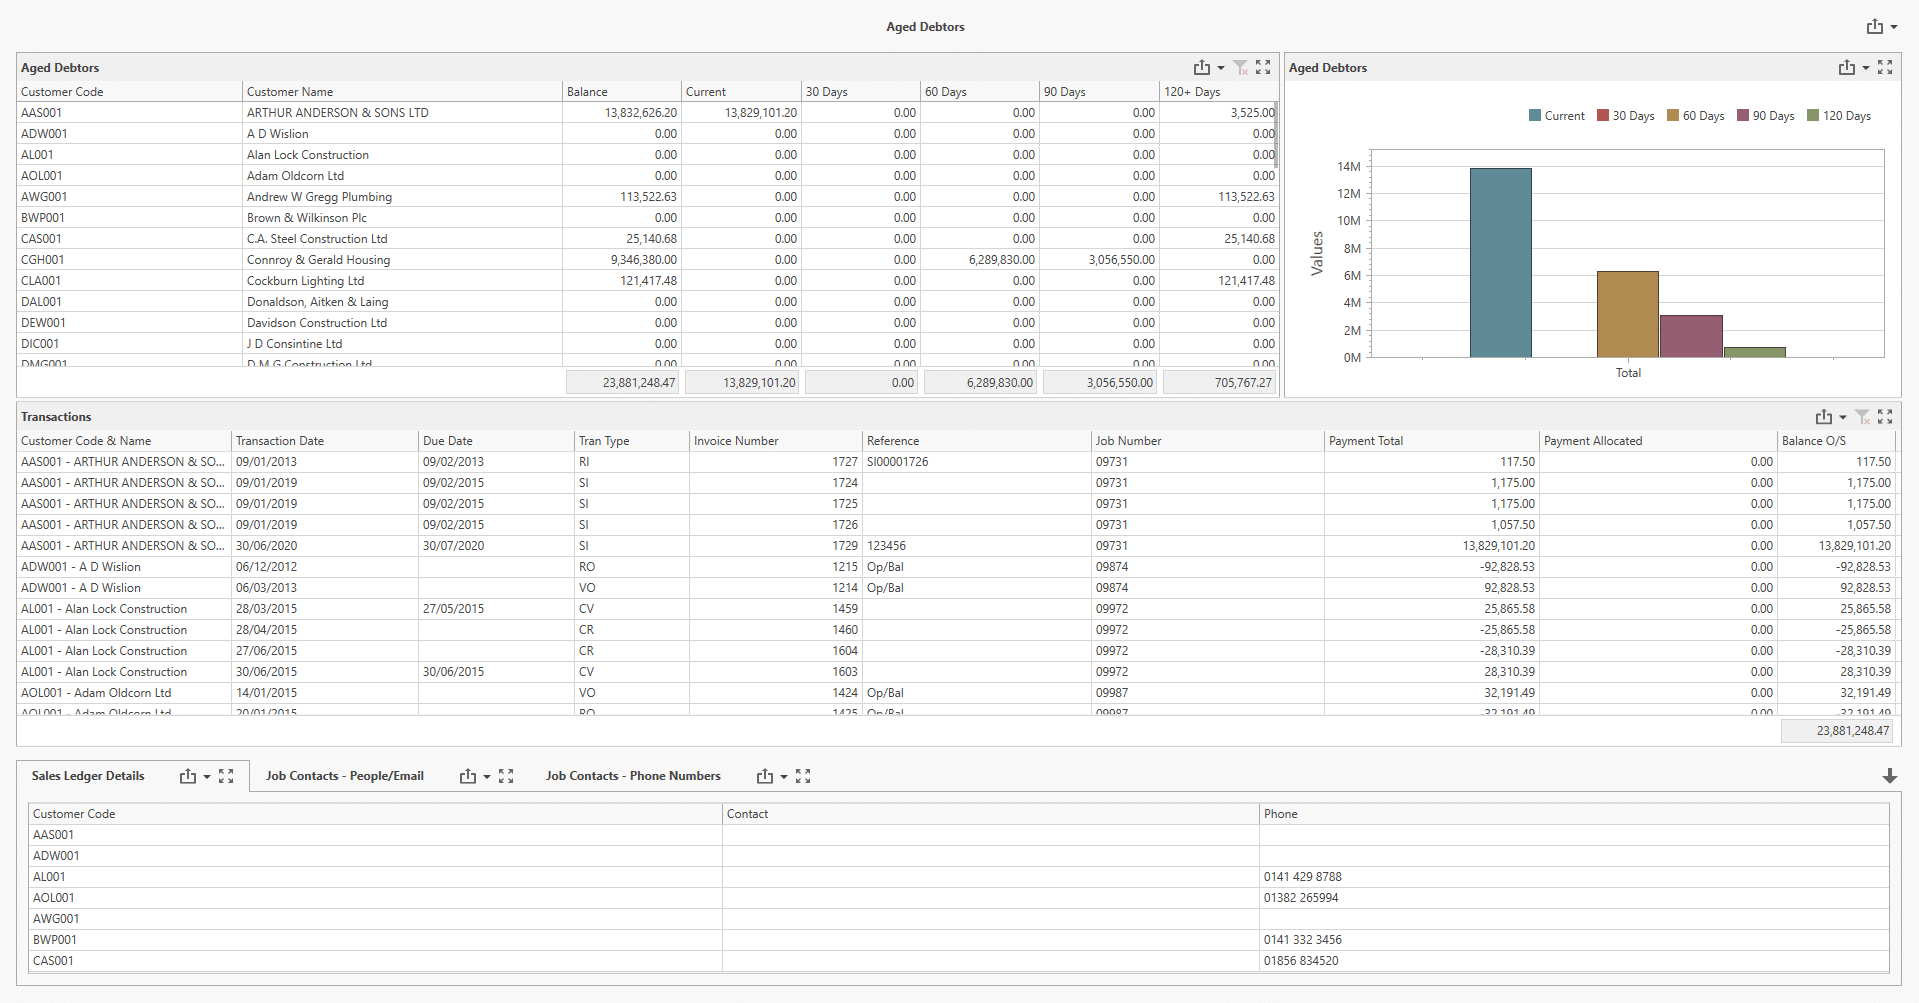 Screenshot of Aged Debtors Dashboard